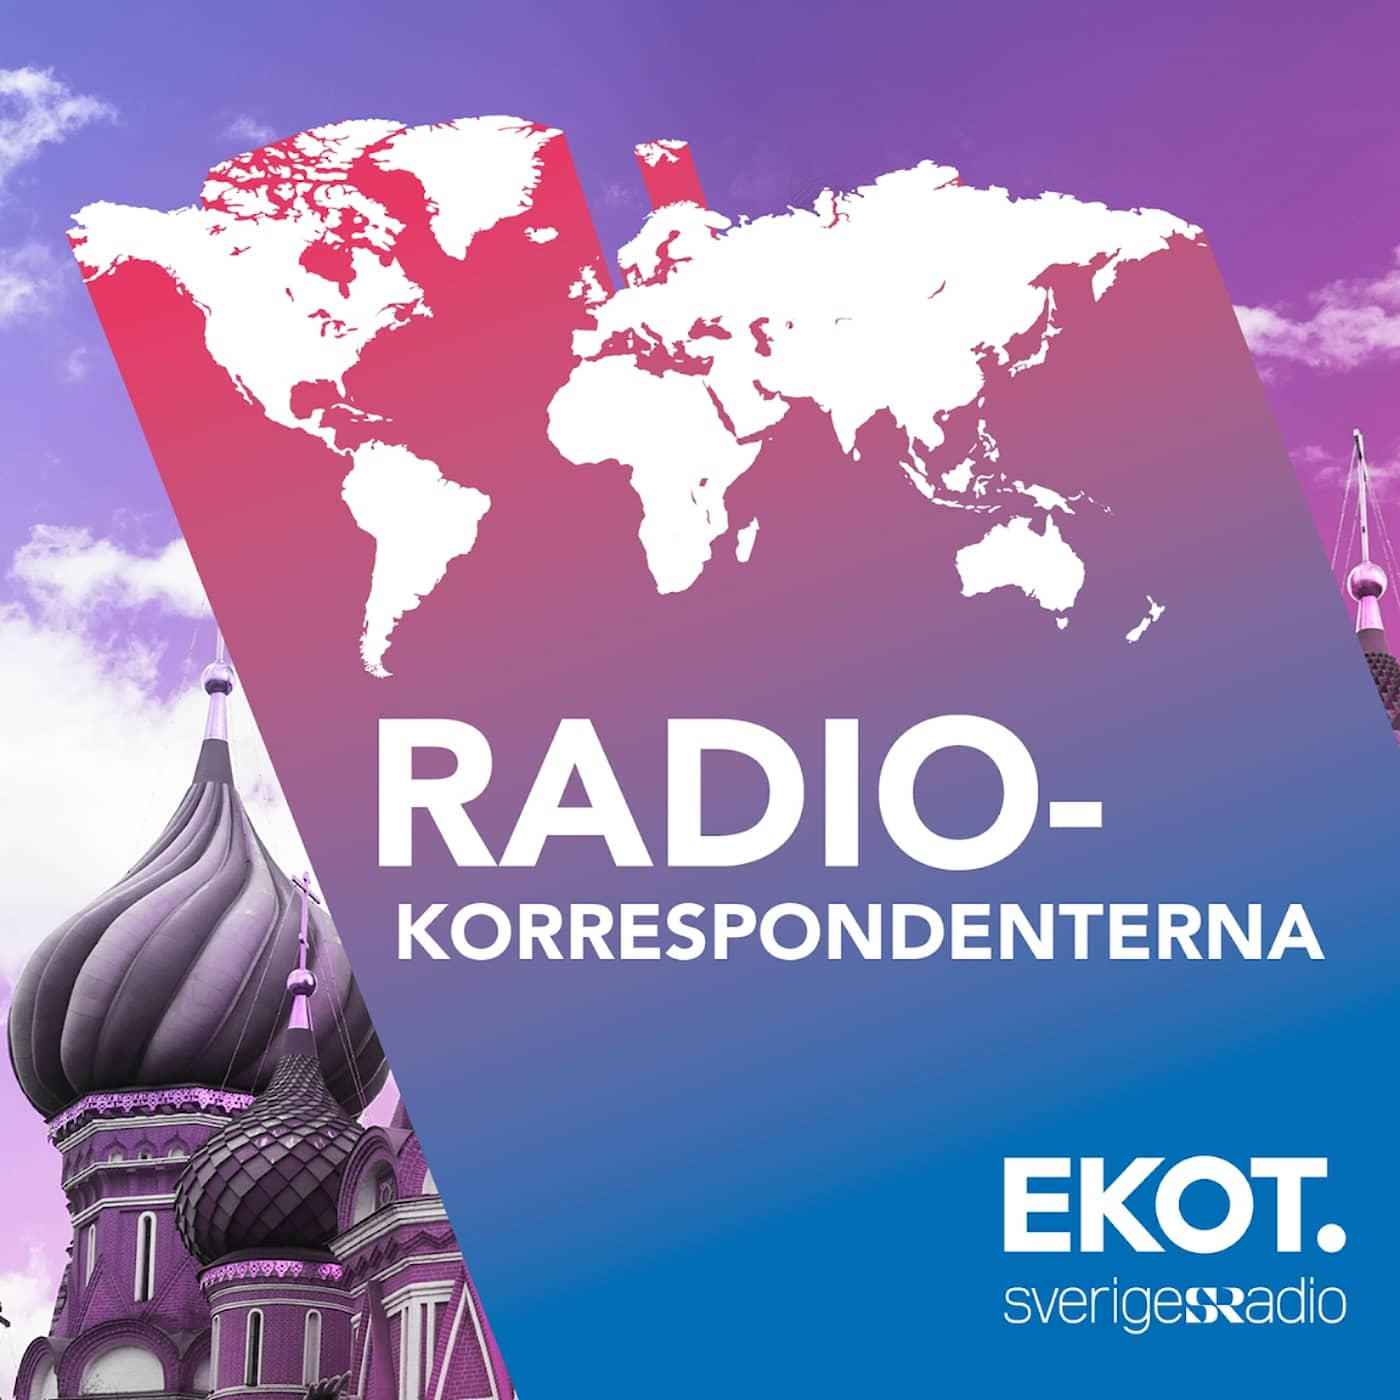 Radiokorrespondenterna